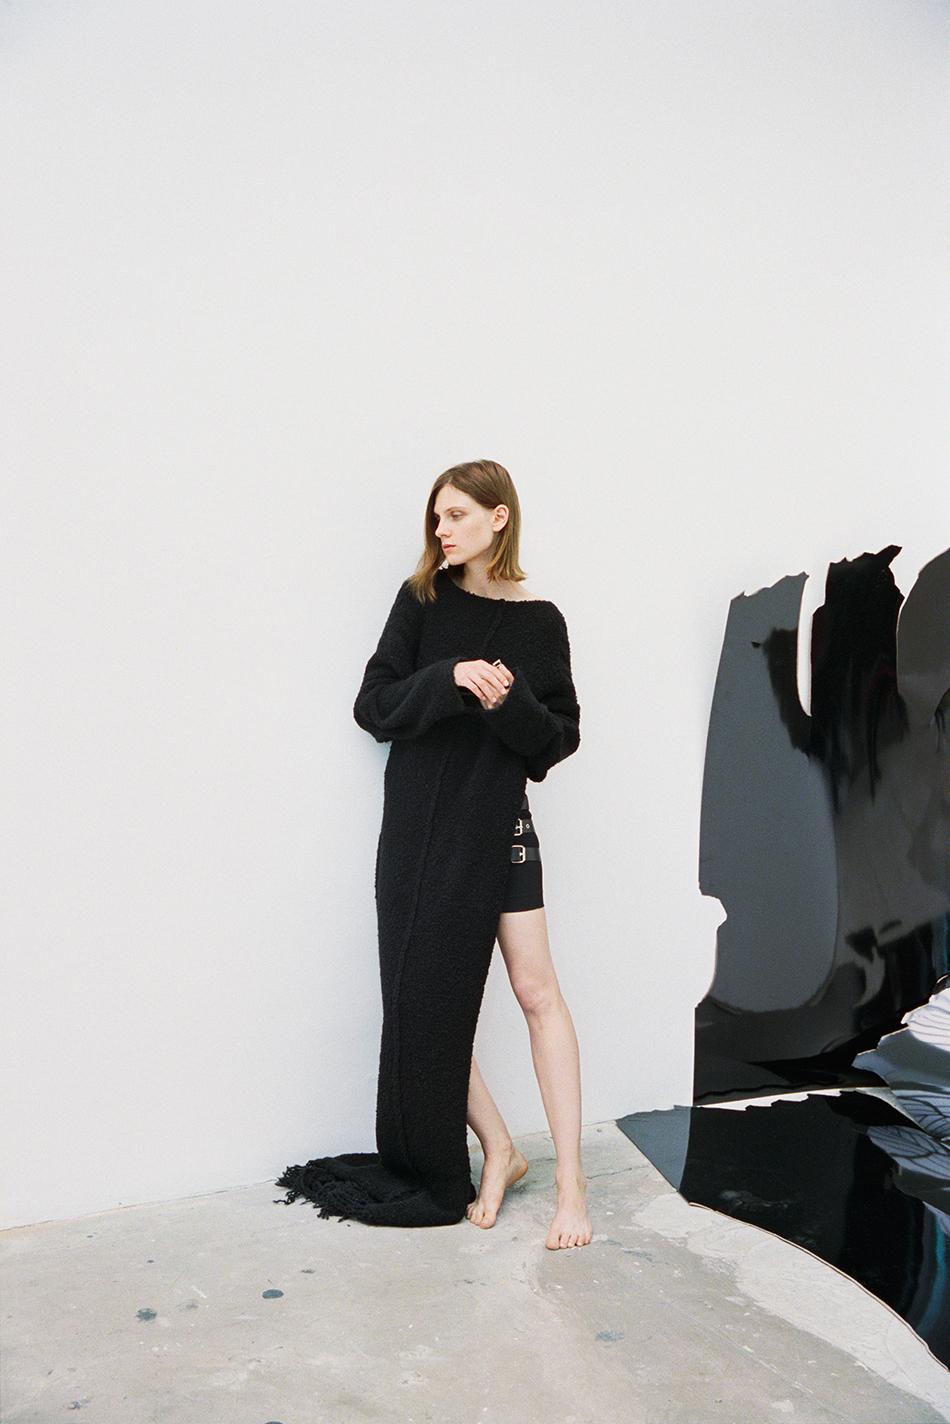 hart_leshkina-maria-loks-wallpaper-magazine-13.jpg